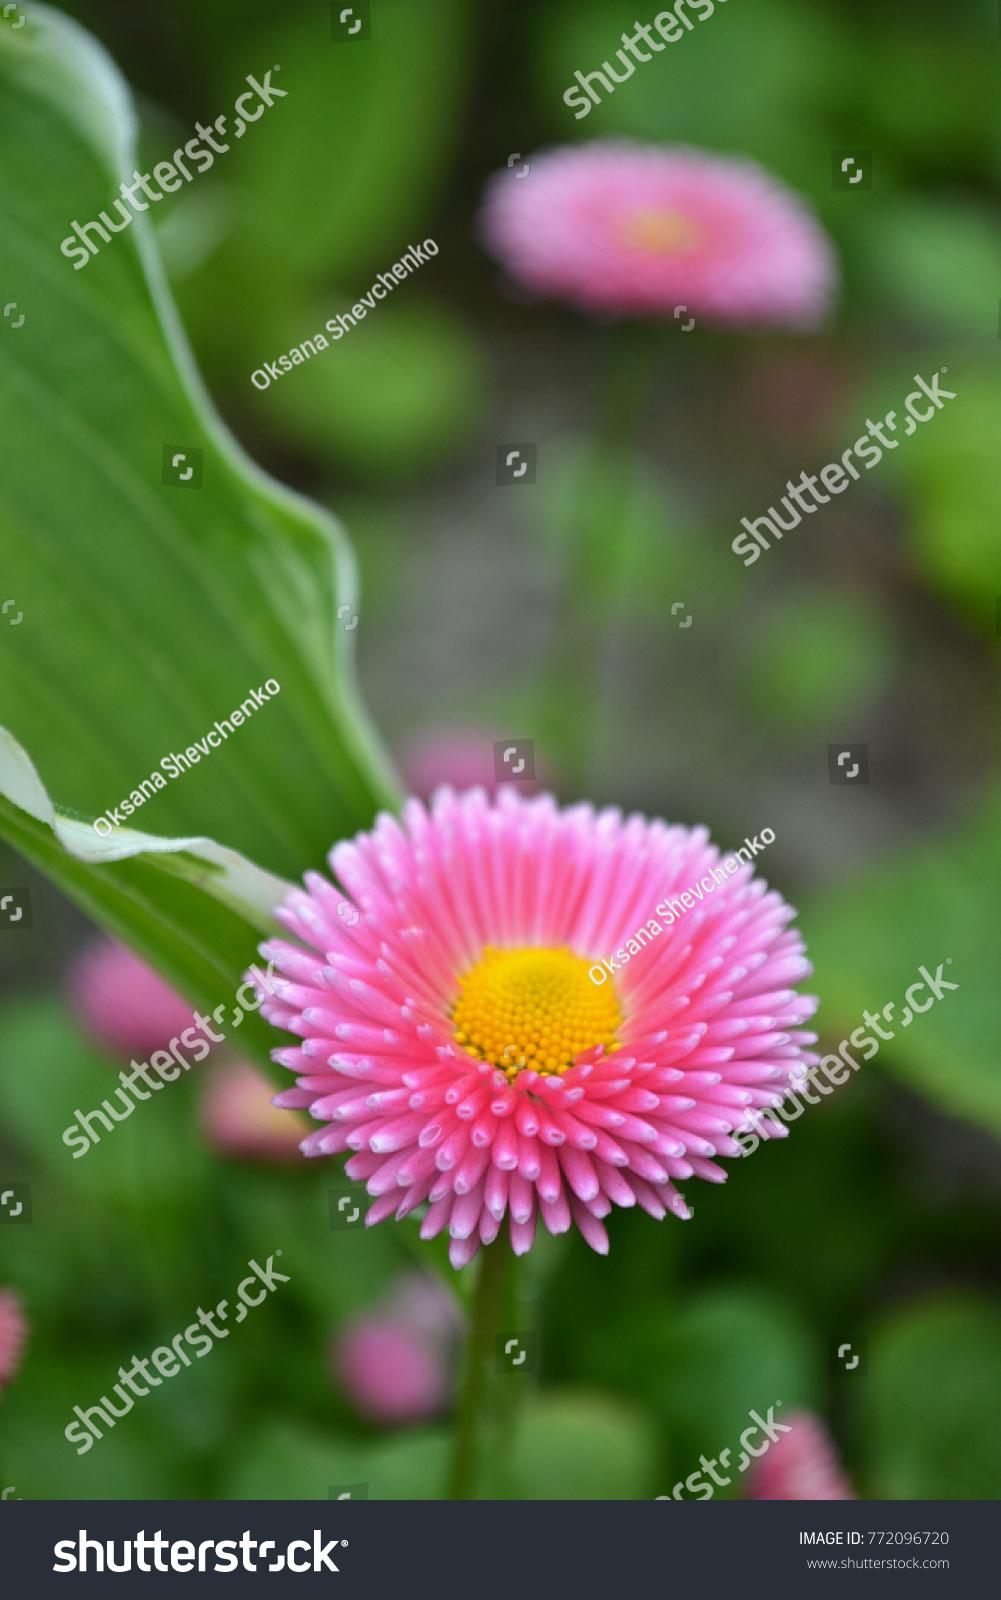 English daisy flower bellis perennis pink stock photo edit now english daisy flower bellis perennis pink color petals english daisy plants izmirmasajfo